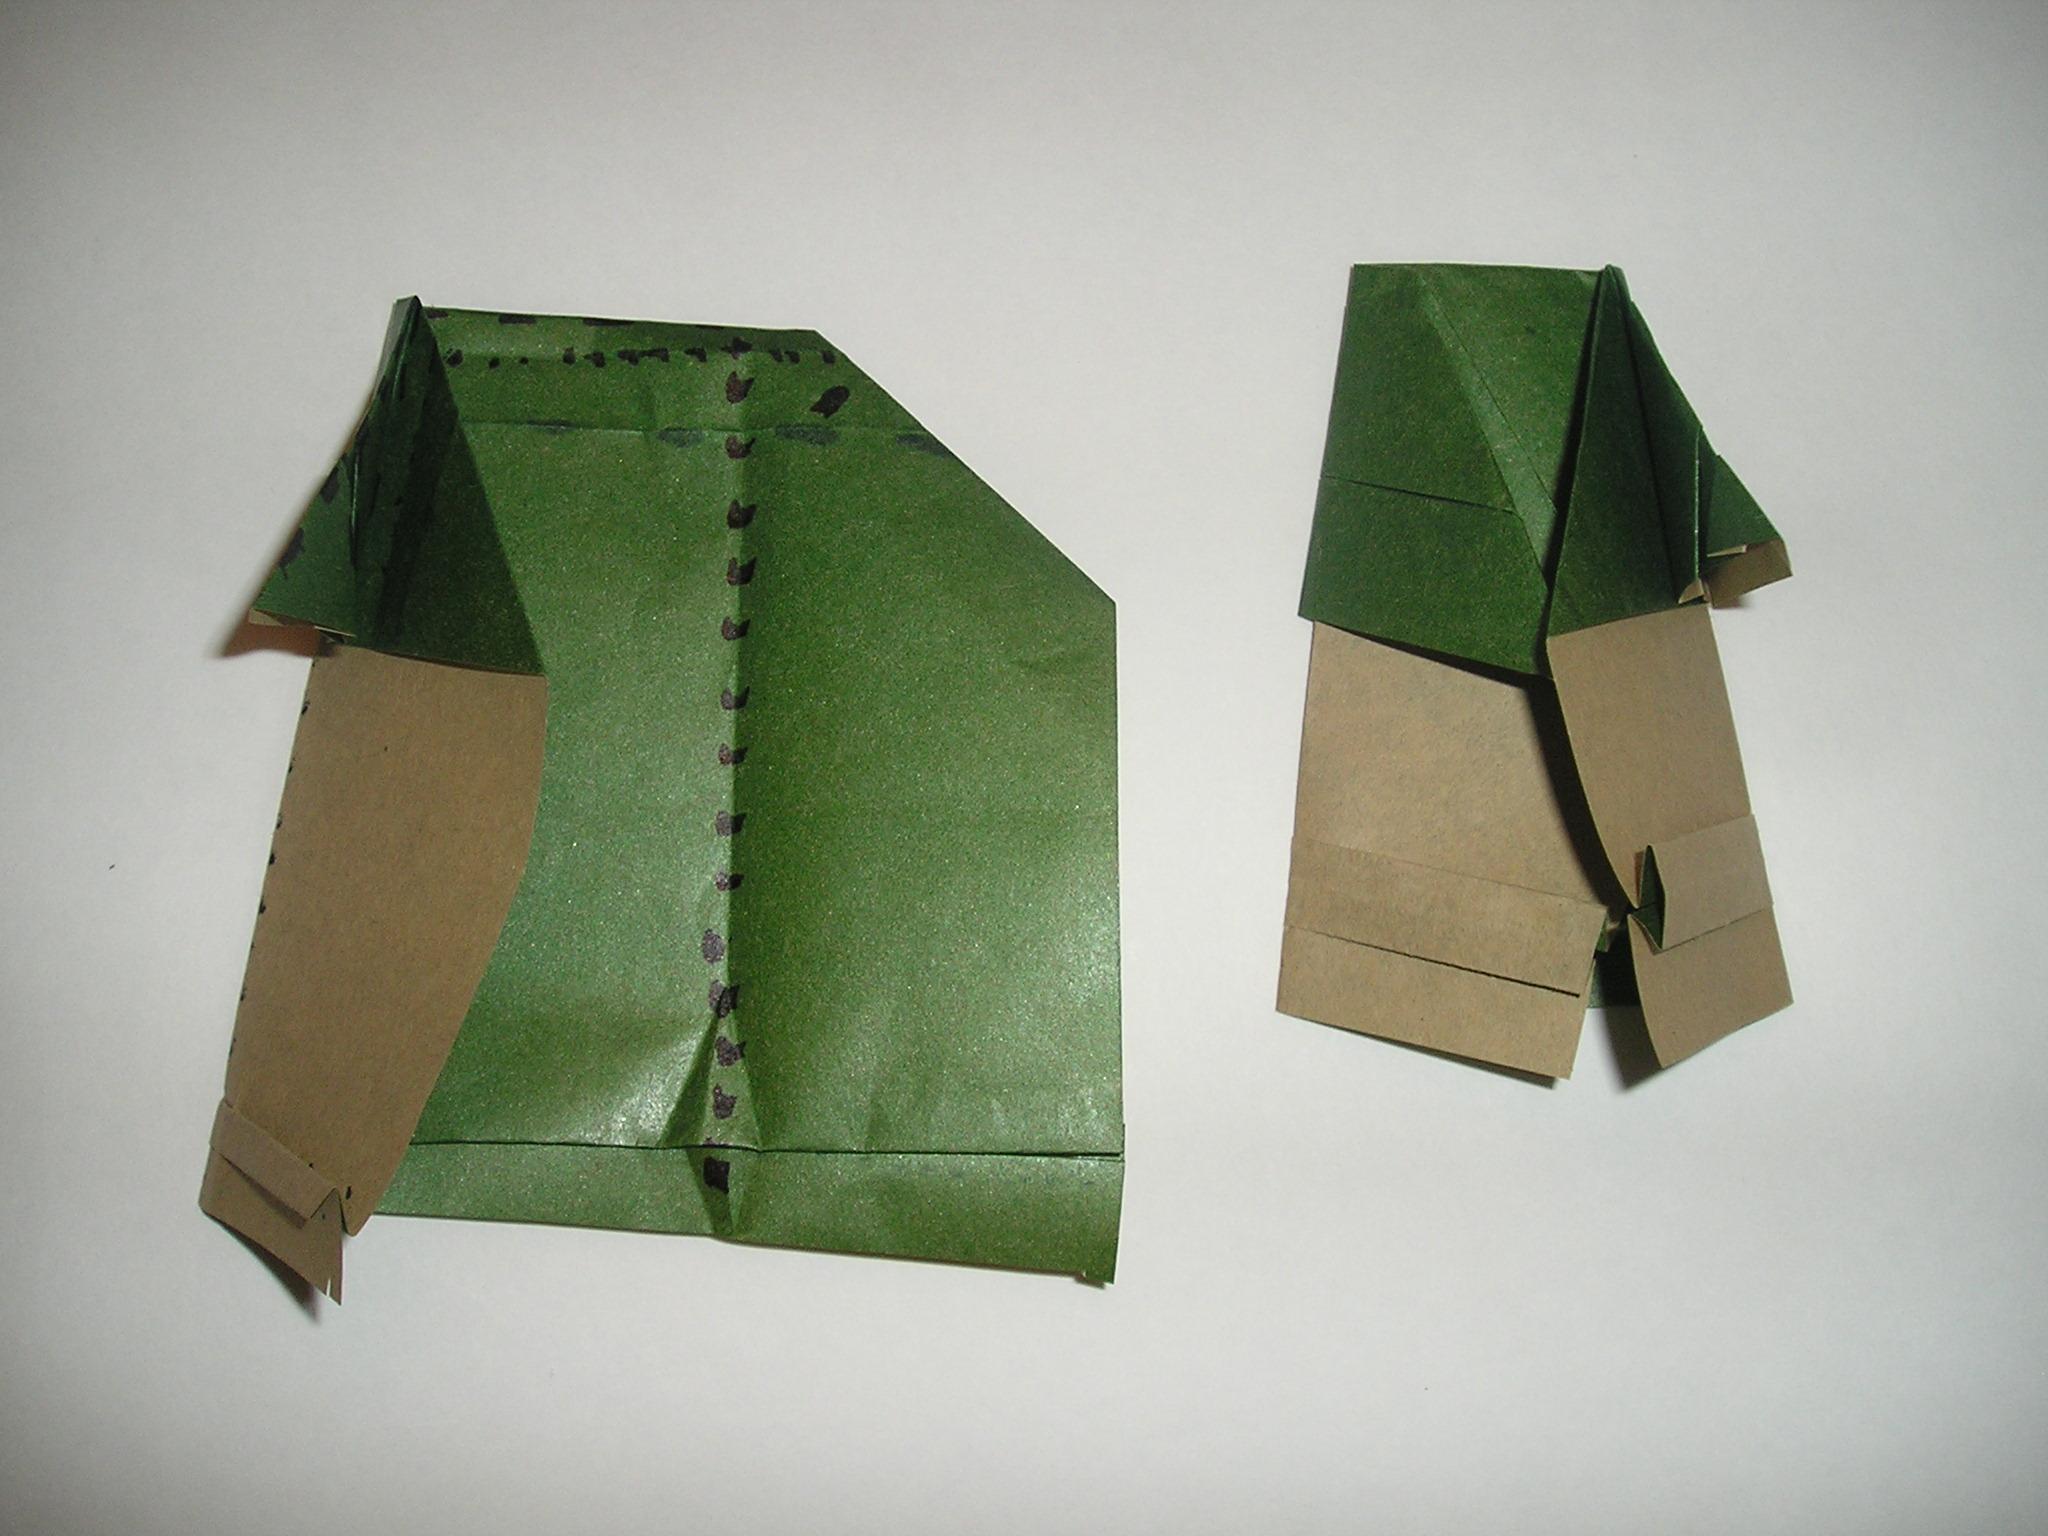 Finally! Instructions for folding an Origami Yoda like the ... - photo#33